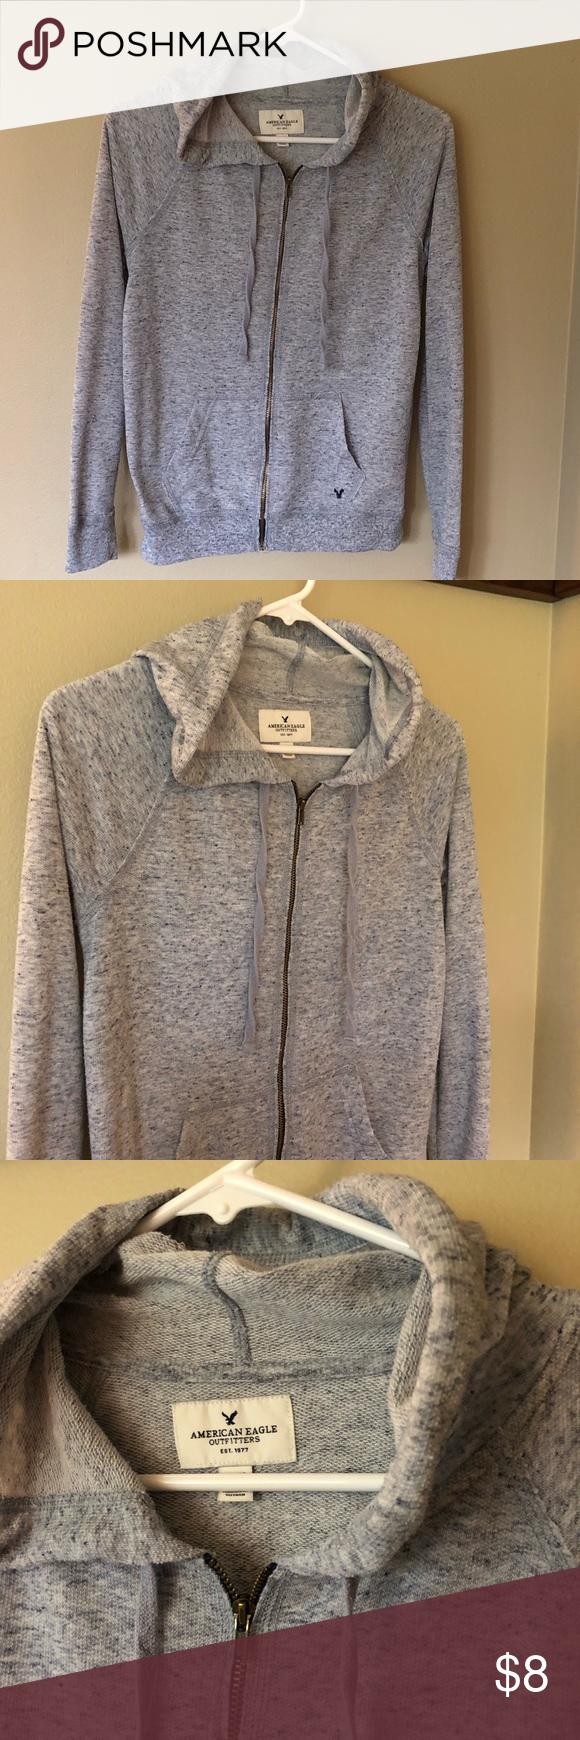 75d2ceb99 American eagle light sweatshirt Fun baby blue comfy light sweatshirt ...